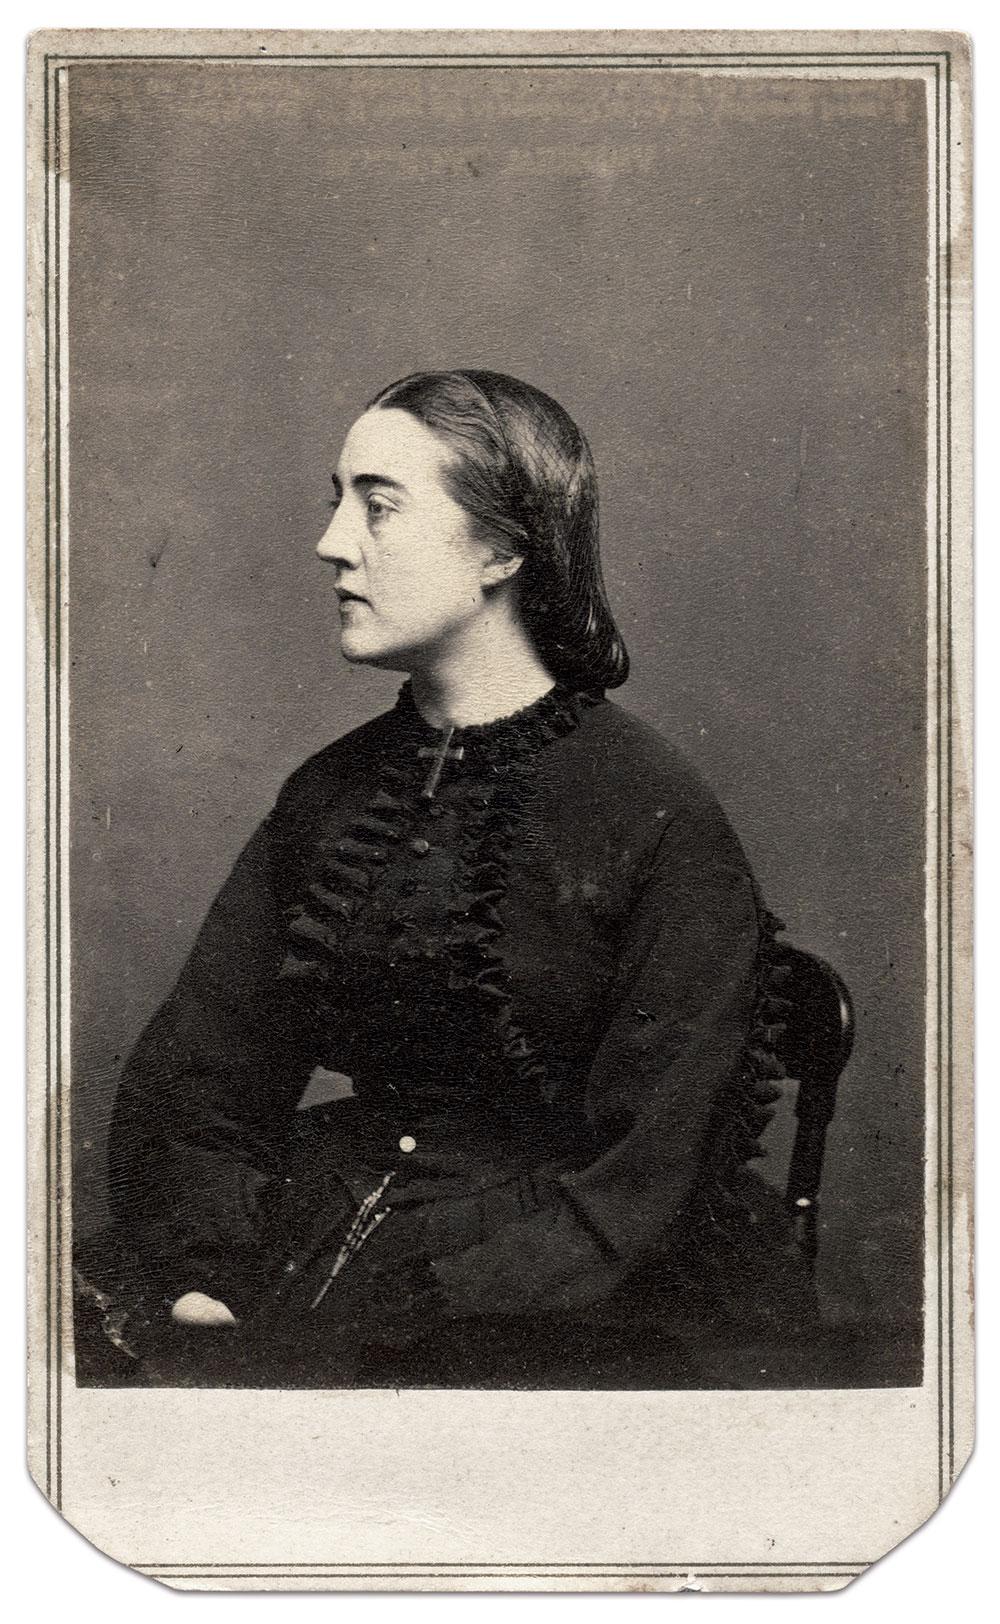 Rose Adéle Cutts Douglas Williams, circa 1864. Carte de visite by Mathew B. Brady of Washington, D.C. Ronald S. Coddington Collection.